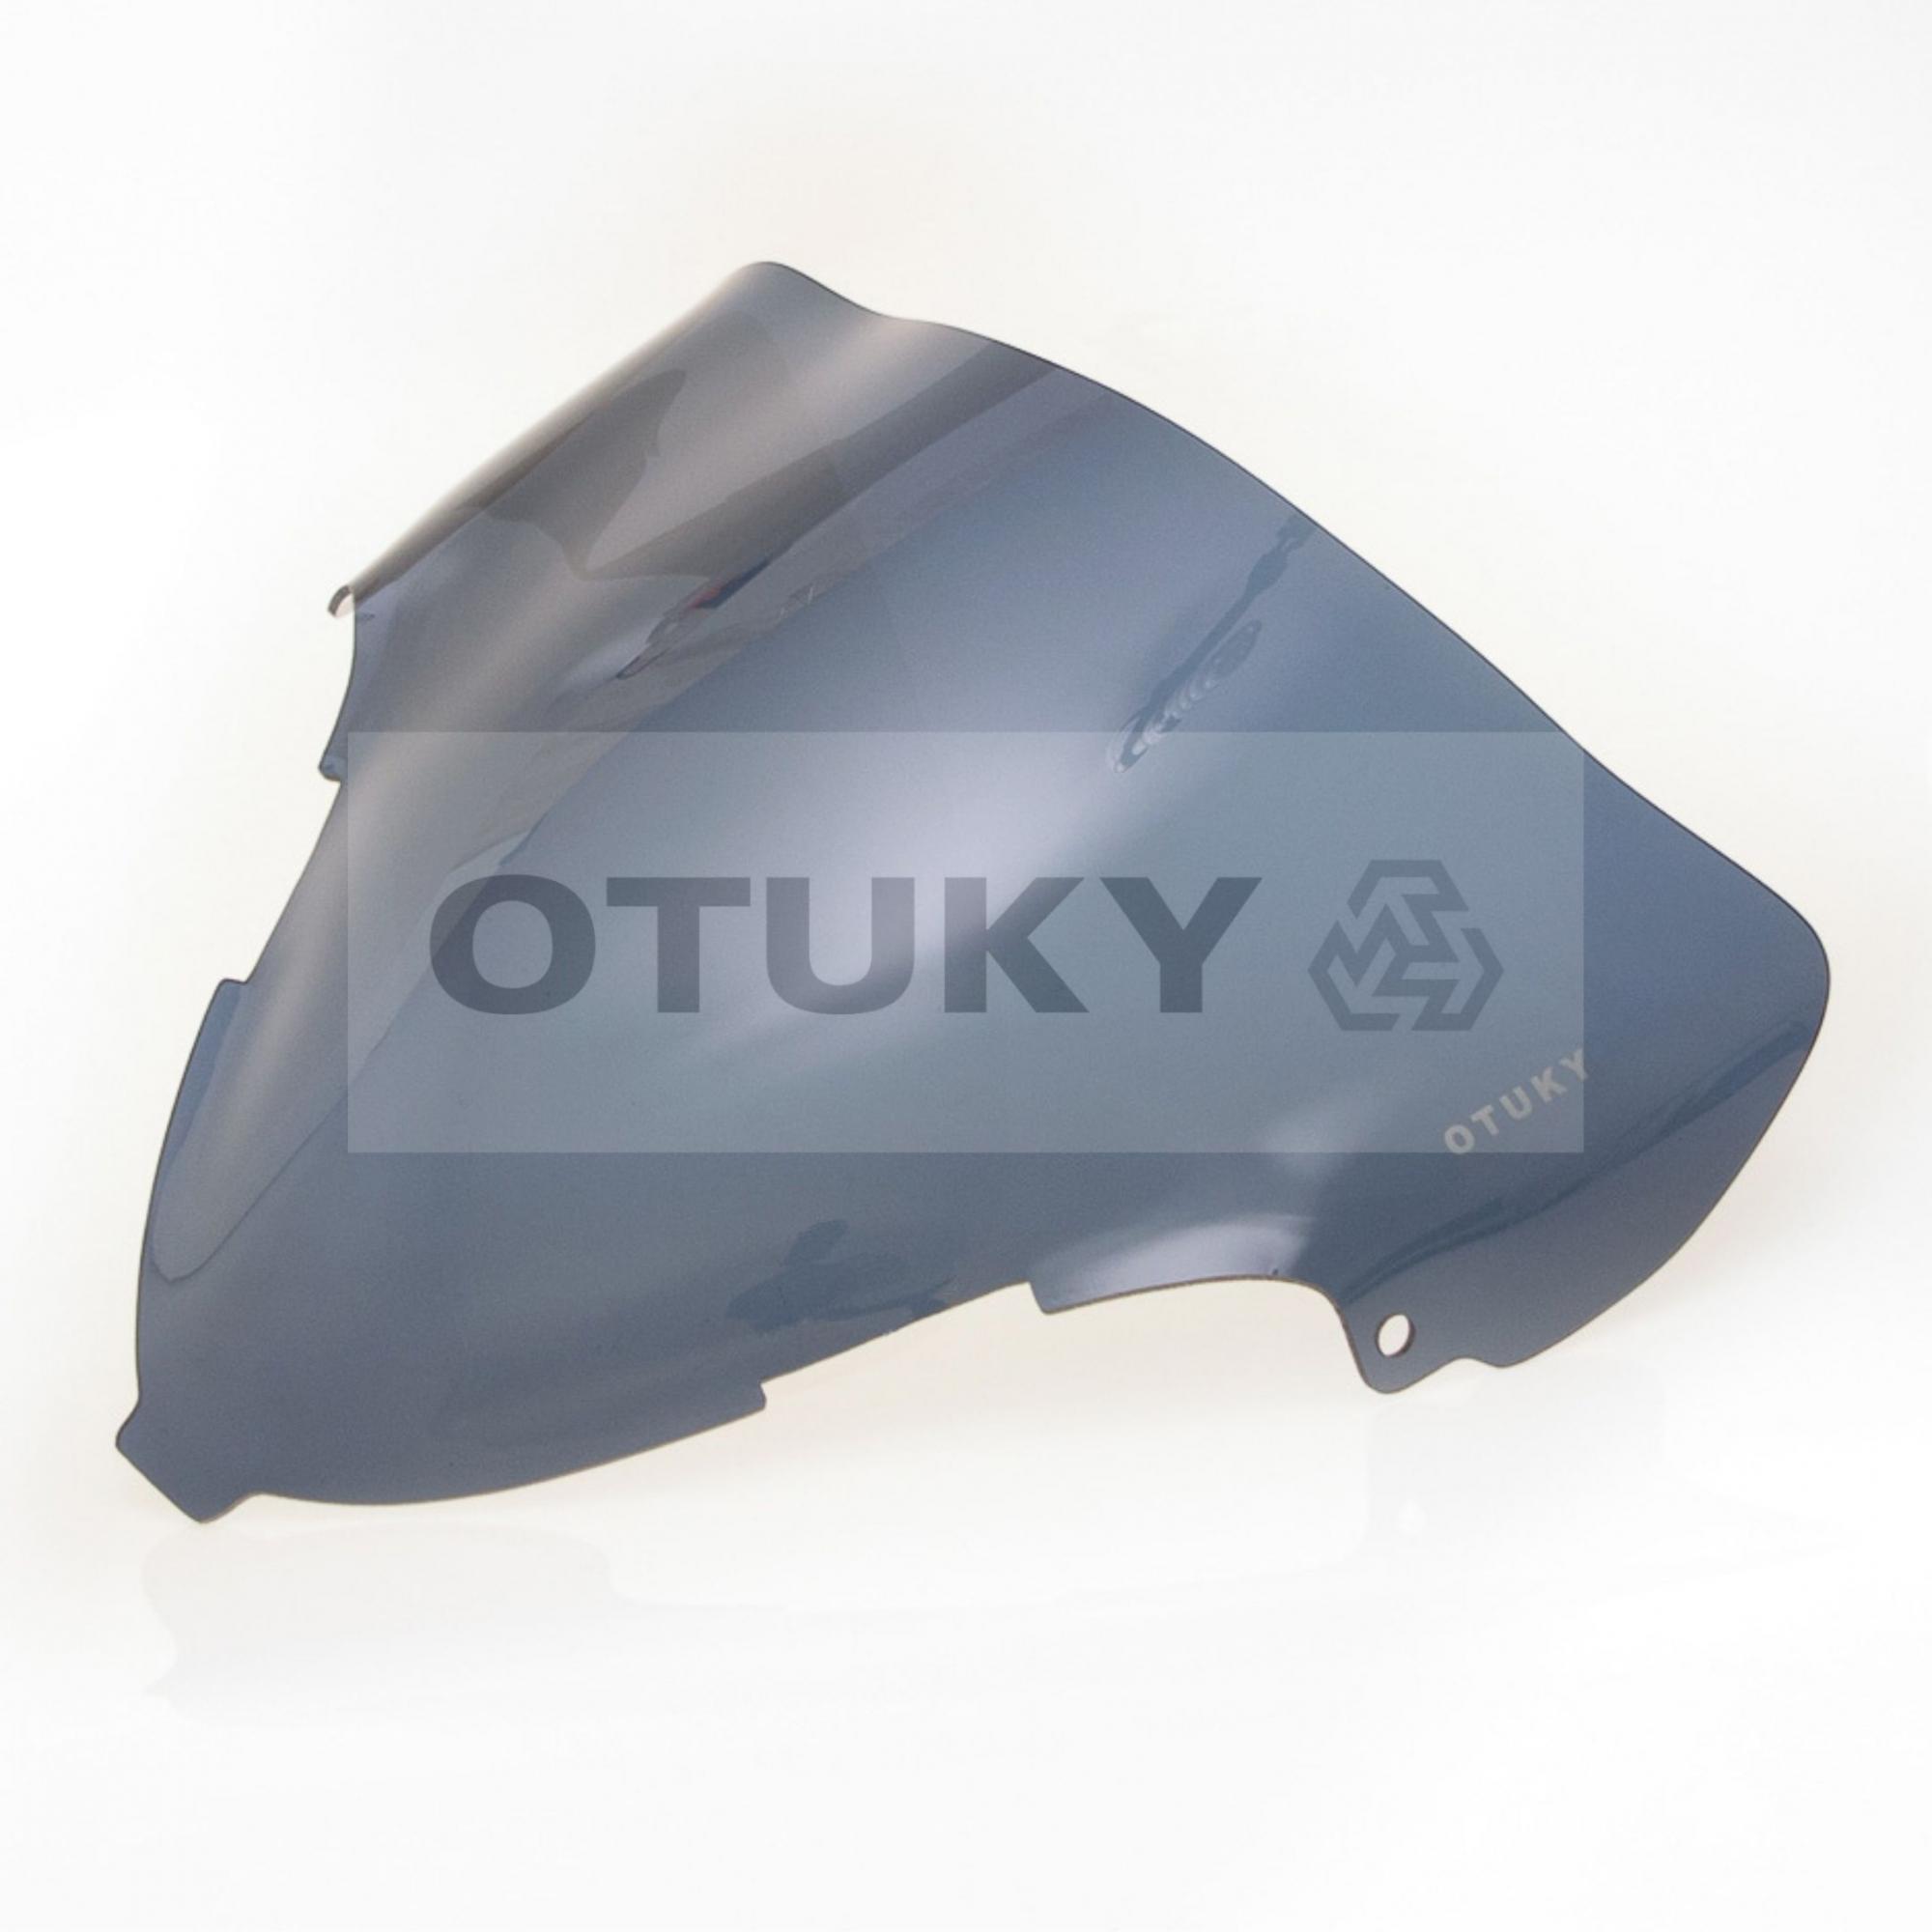 Bolha para Moto GSX 1300 R Hayabusa 1999 2000 2001 2002 2003 2004 2005 2006 2007 Otuky Fumê Escuro